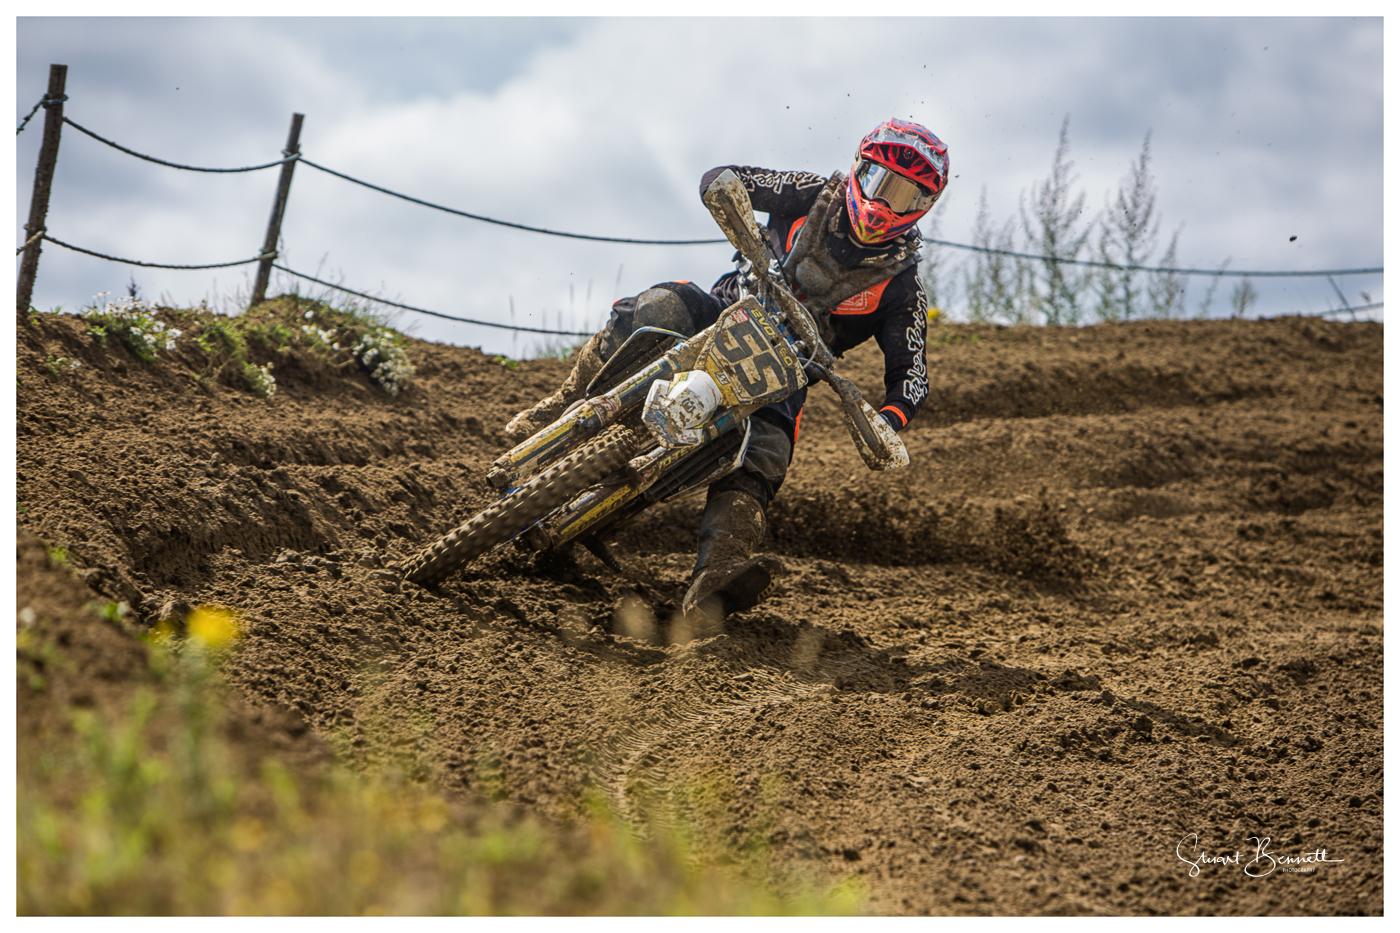 Southern Motocross - 23rd July 2017 (264 of 291).JPG